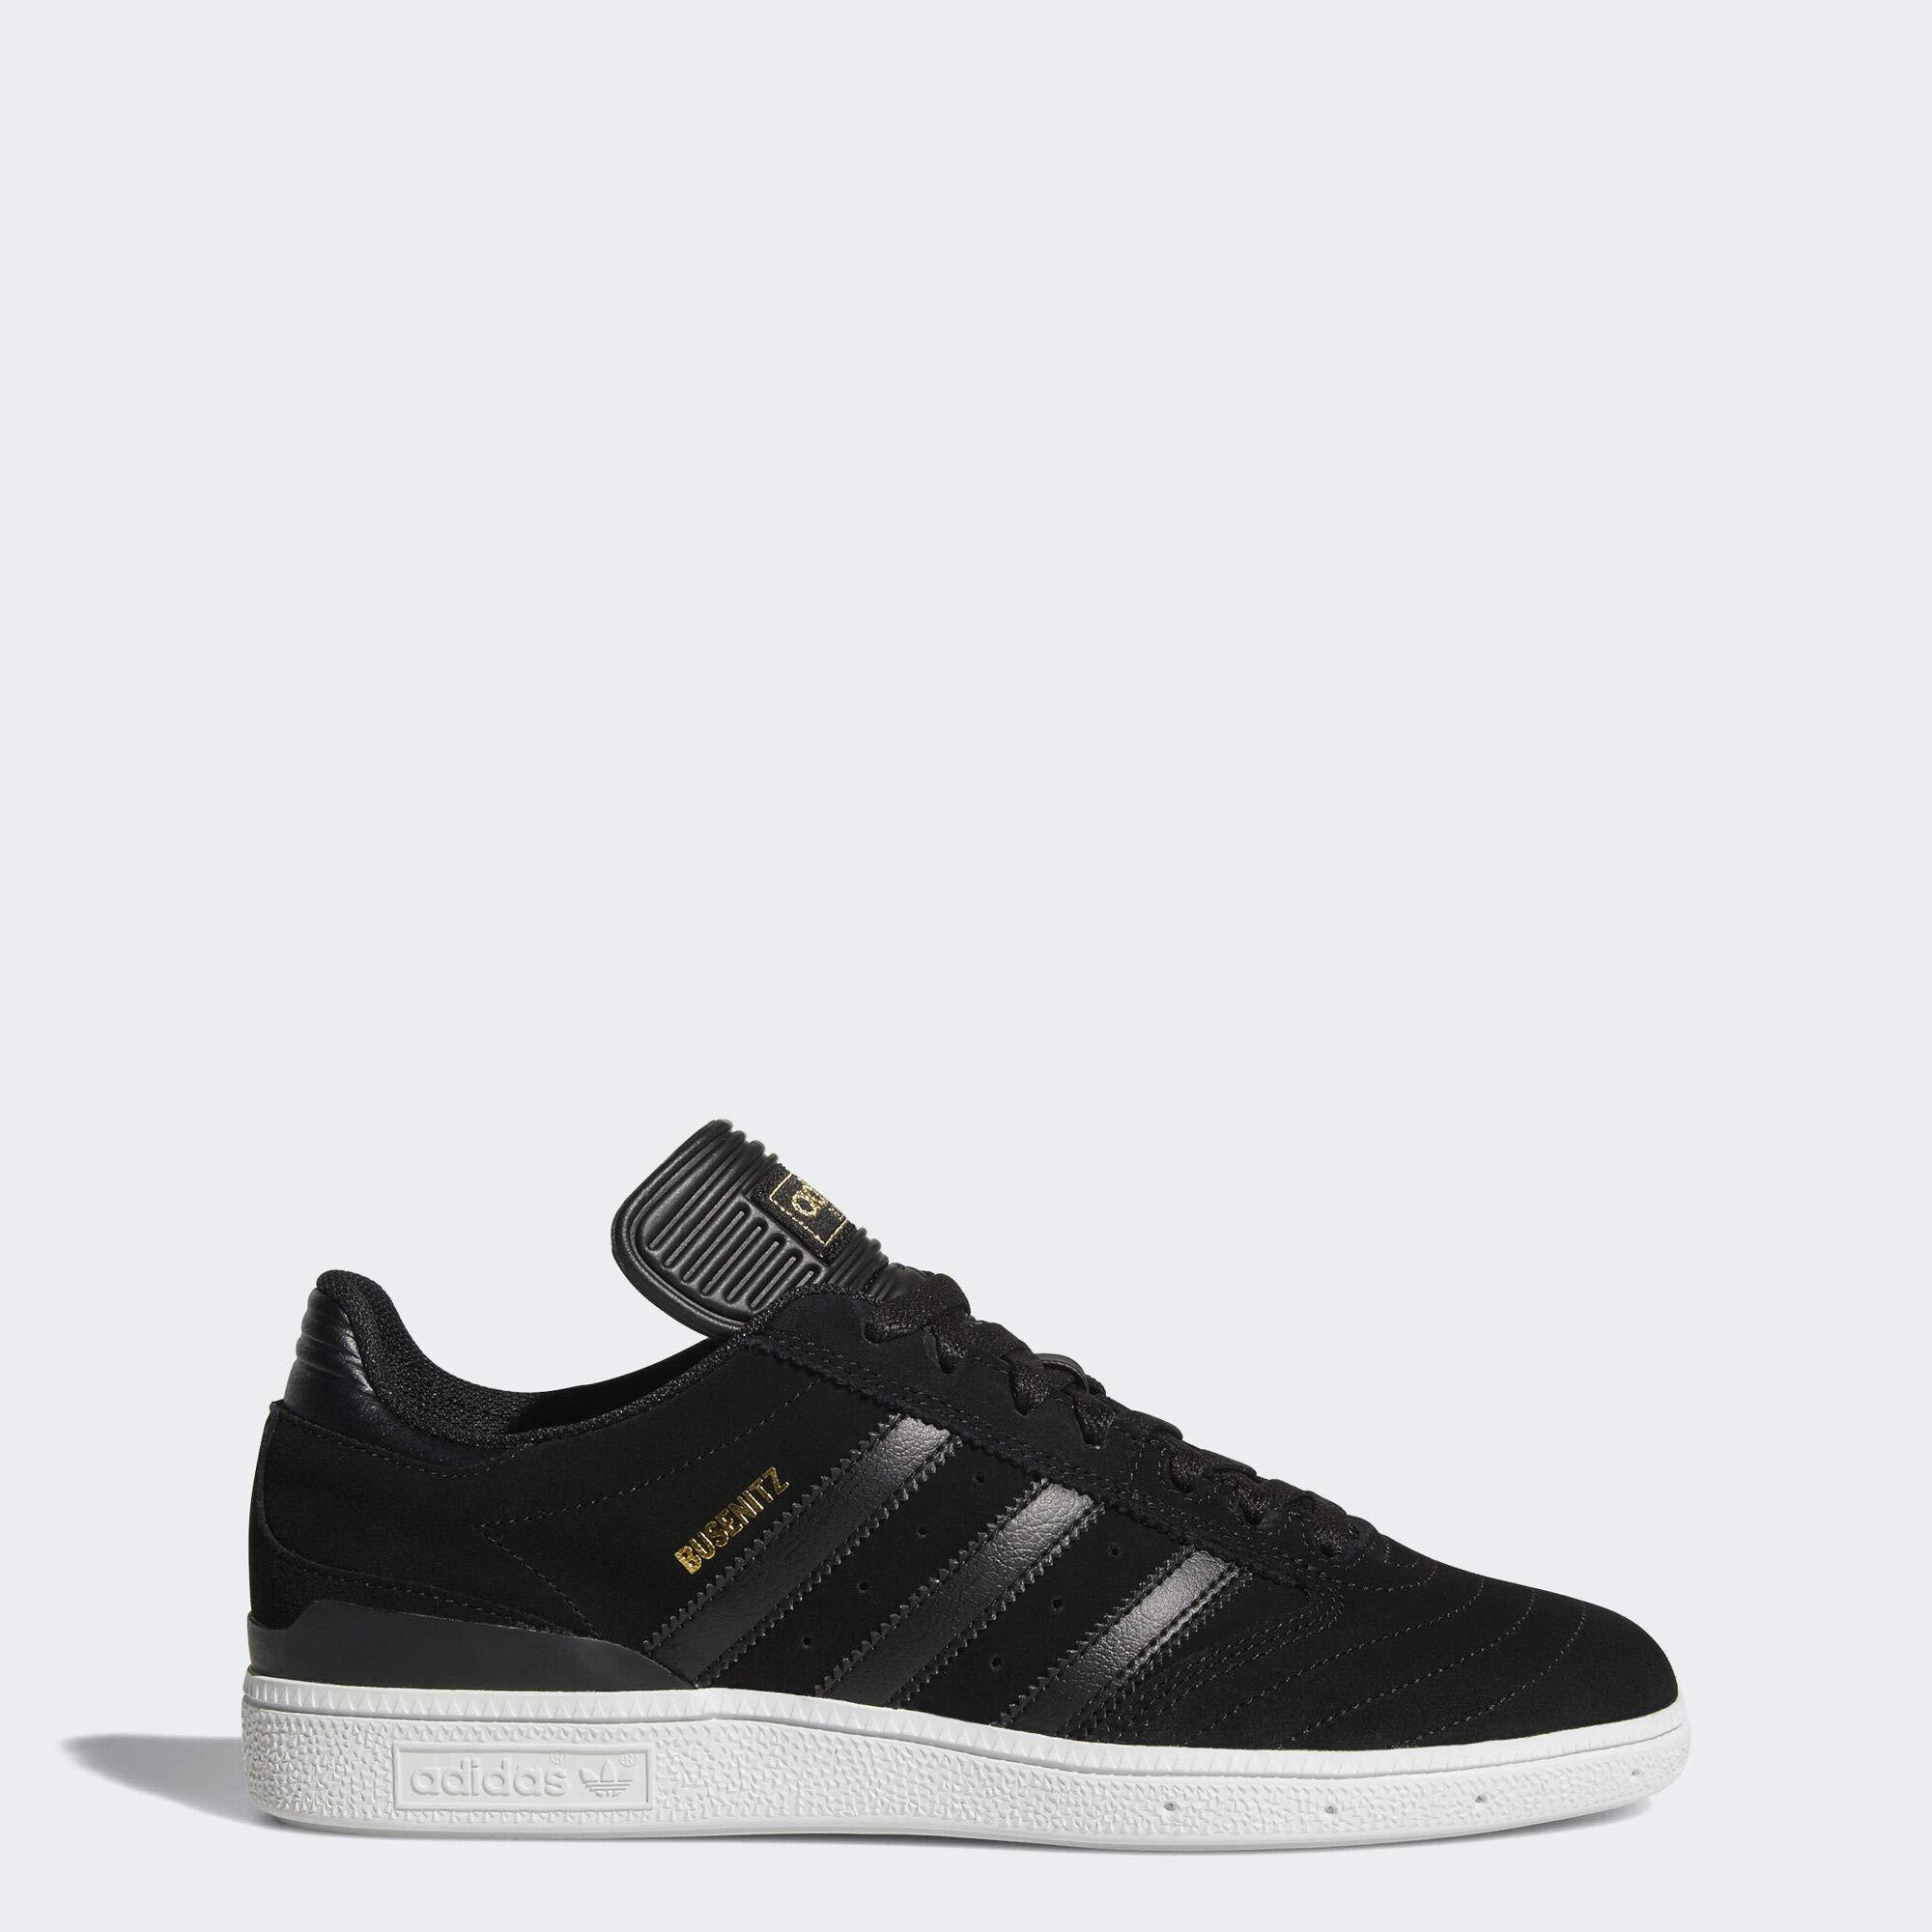 adidas Originals Men's Busenitz Skate Shoe, Black/White, 10.5 M US by adidas Originals